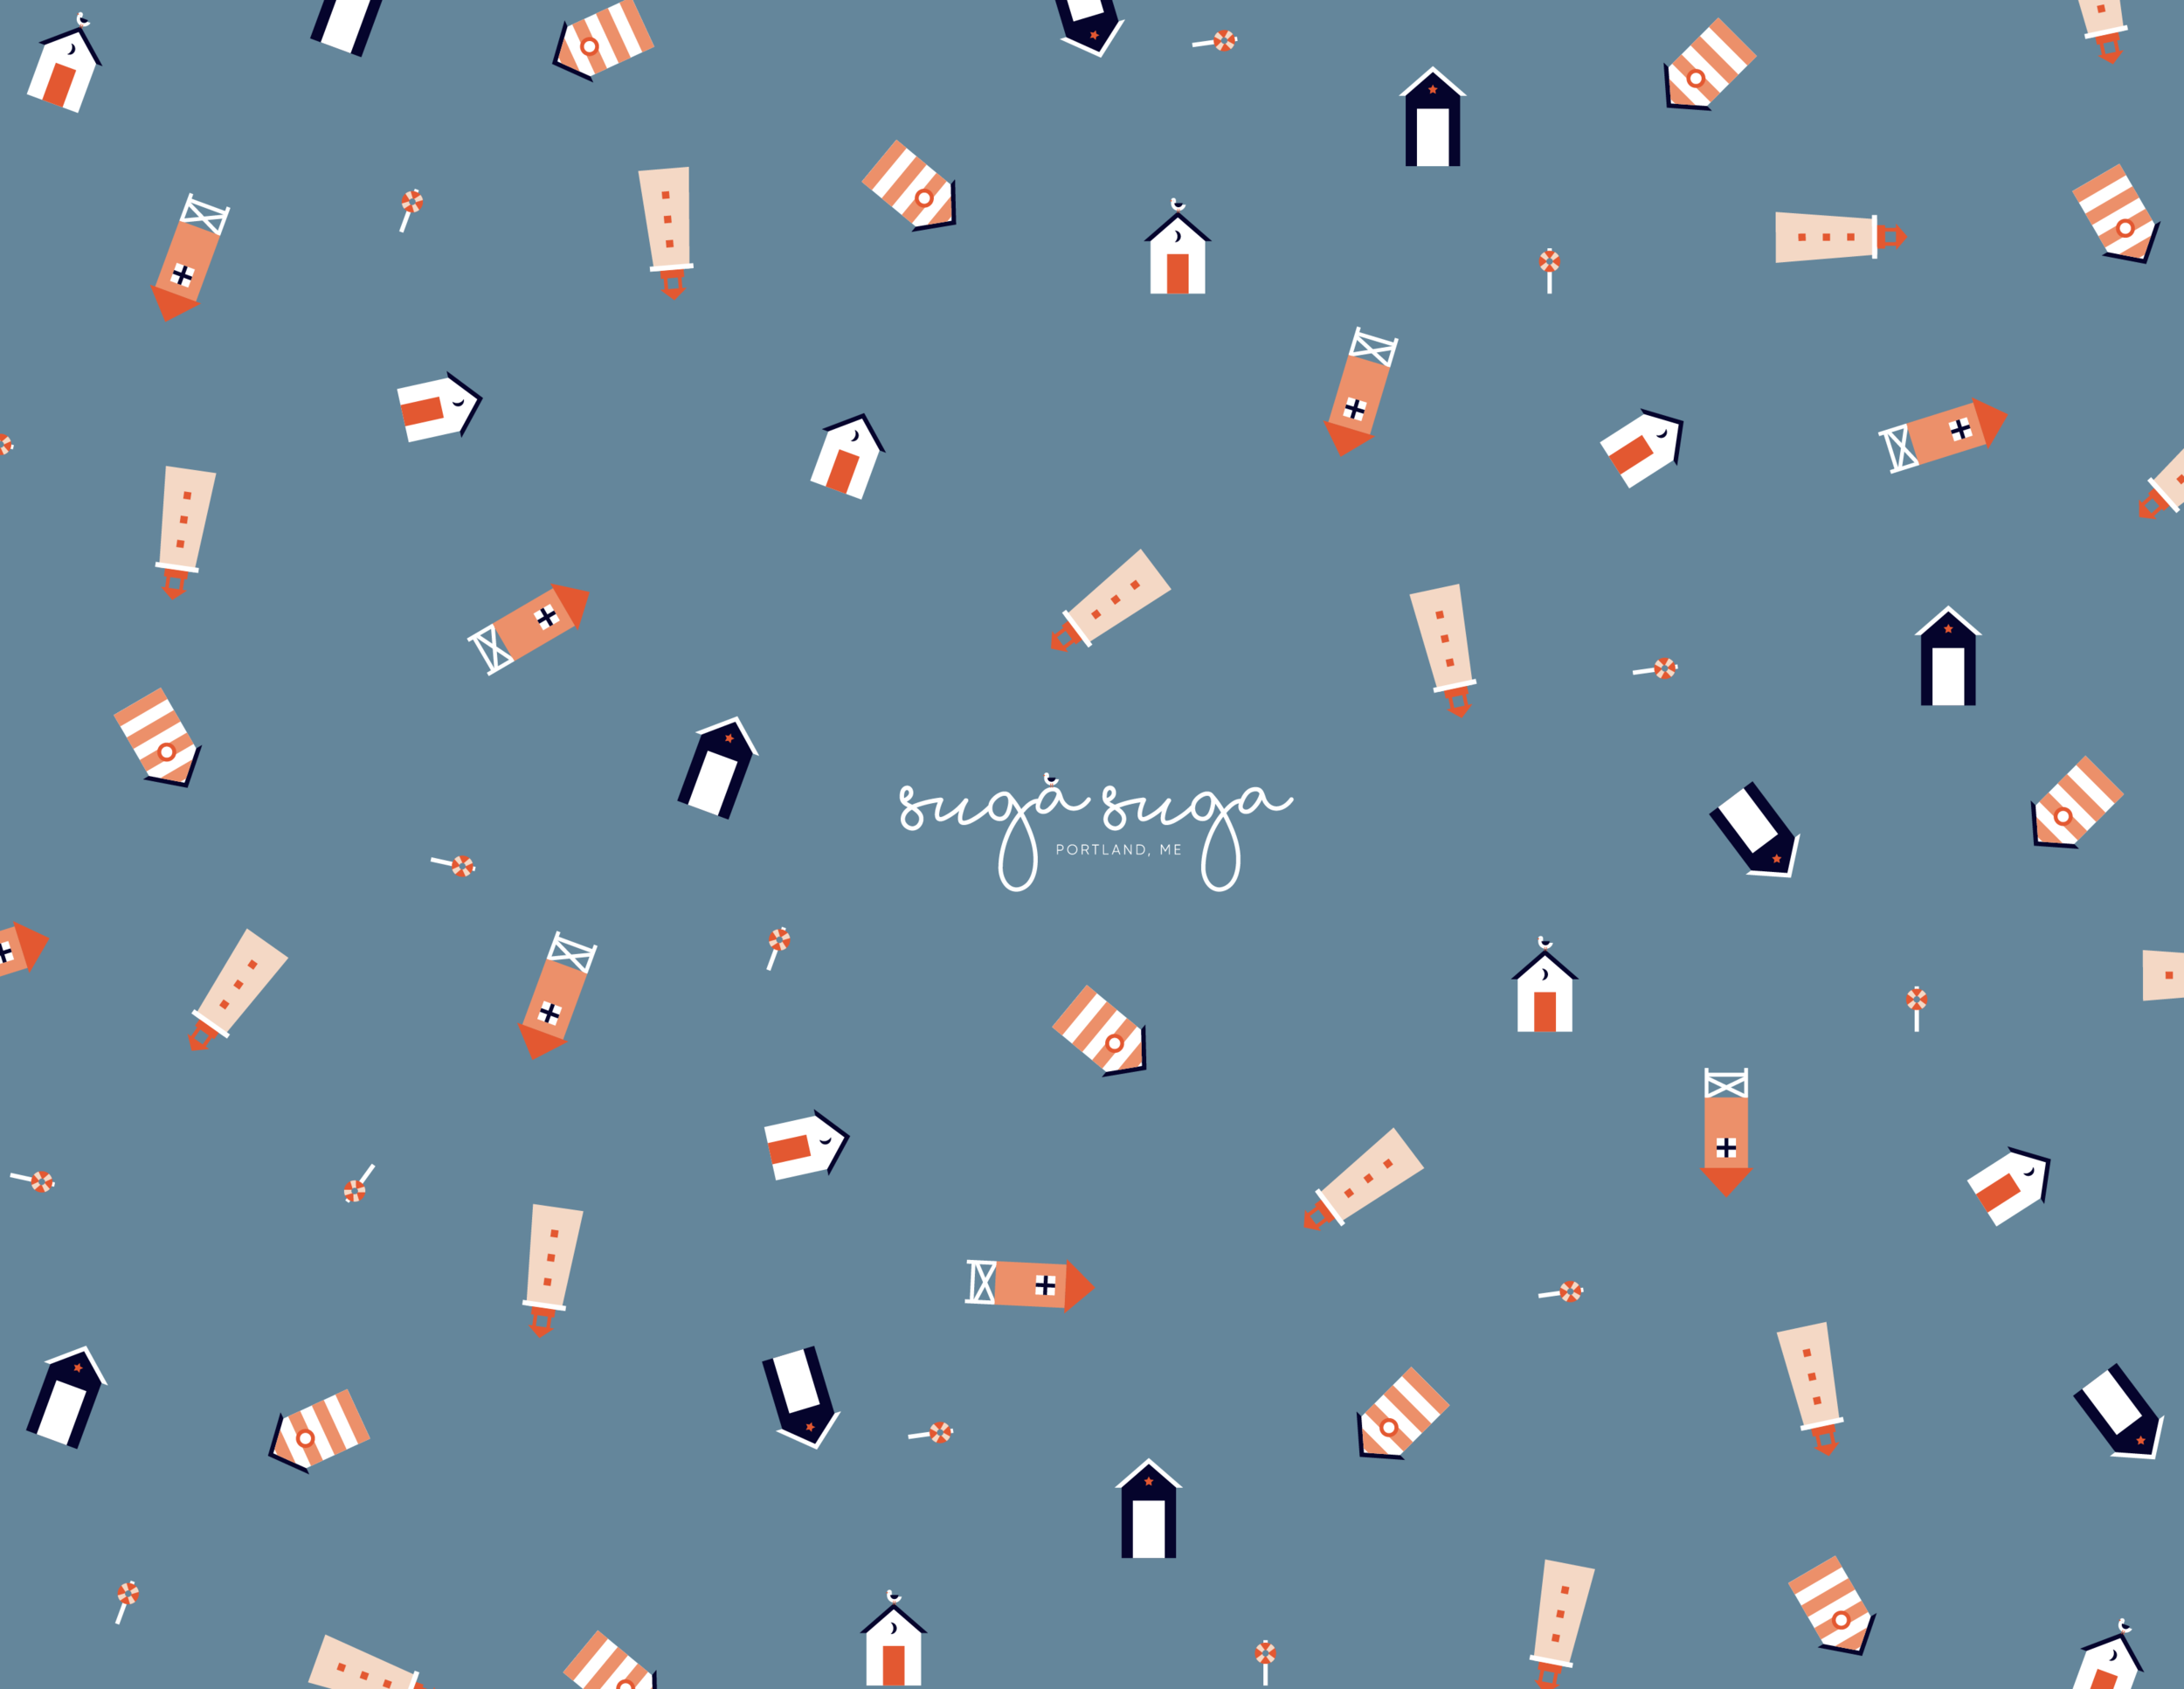 SugaSuga_Packaging_30Jan2019-05.png